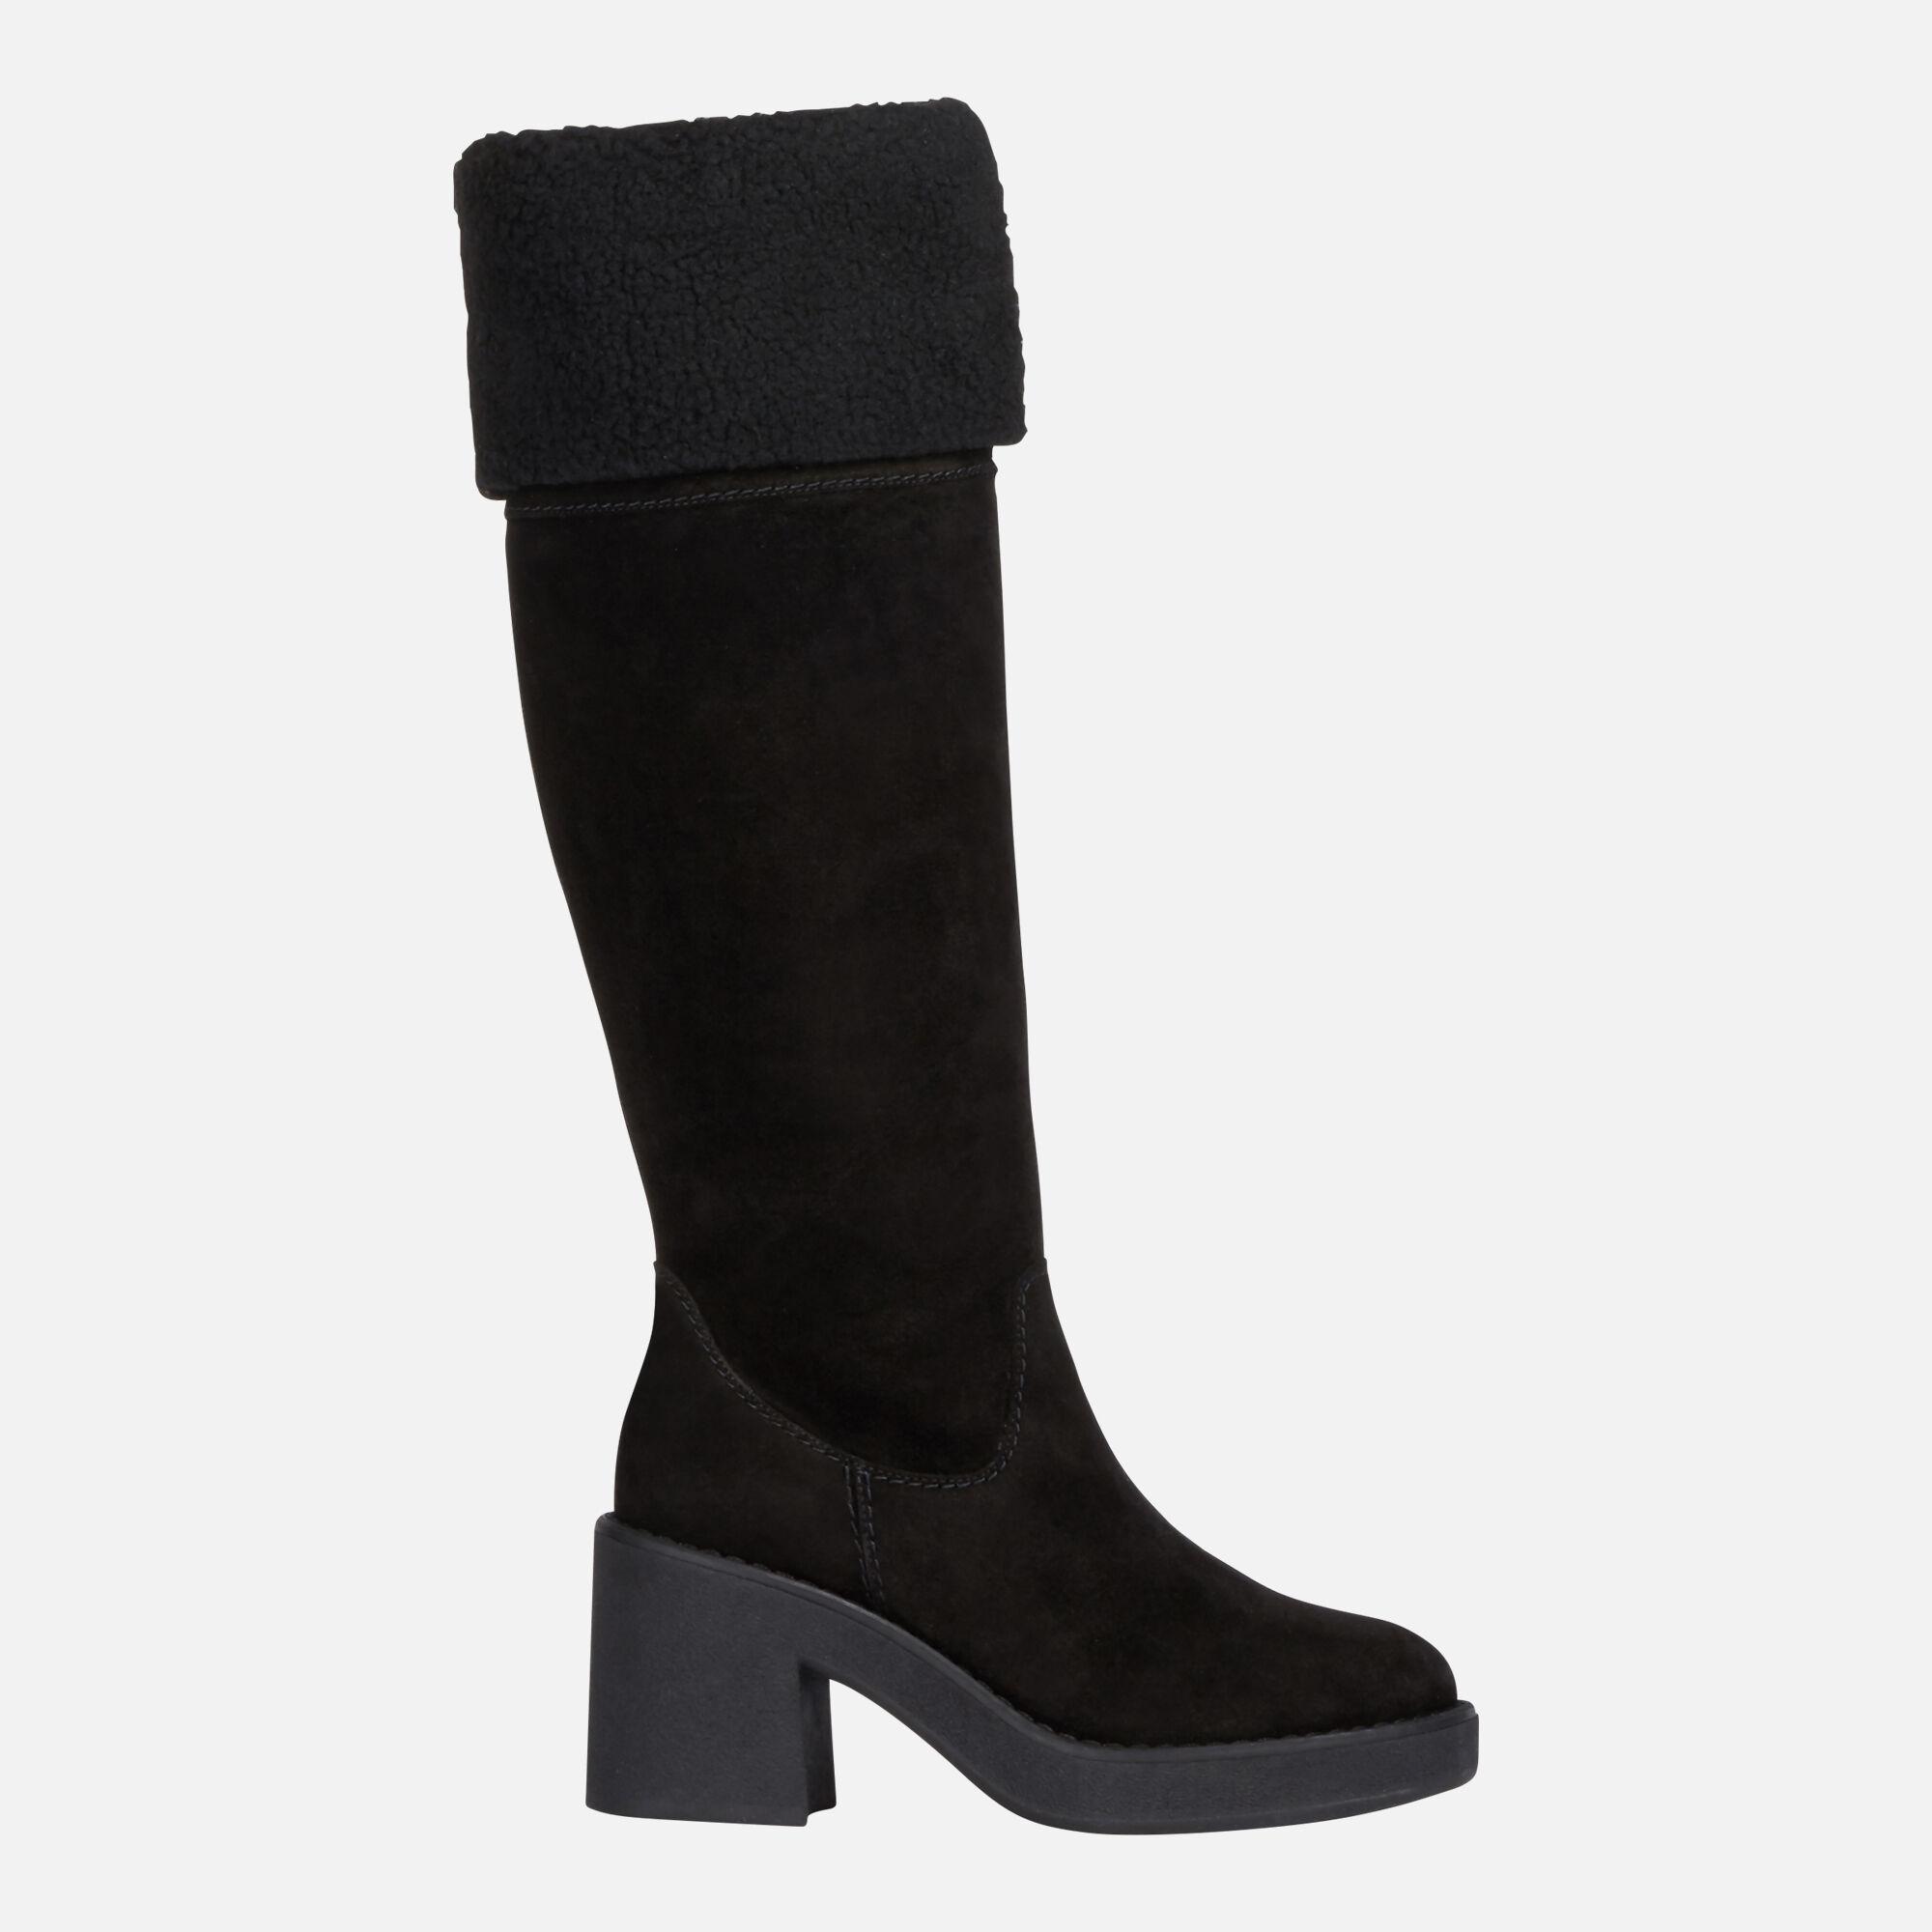 Geox ADRYA MID Frau: schwarze High Heel Stiefeln | Geox ®